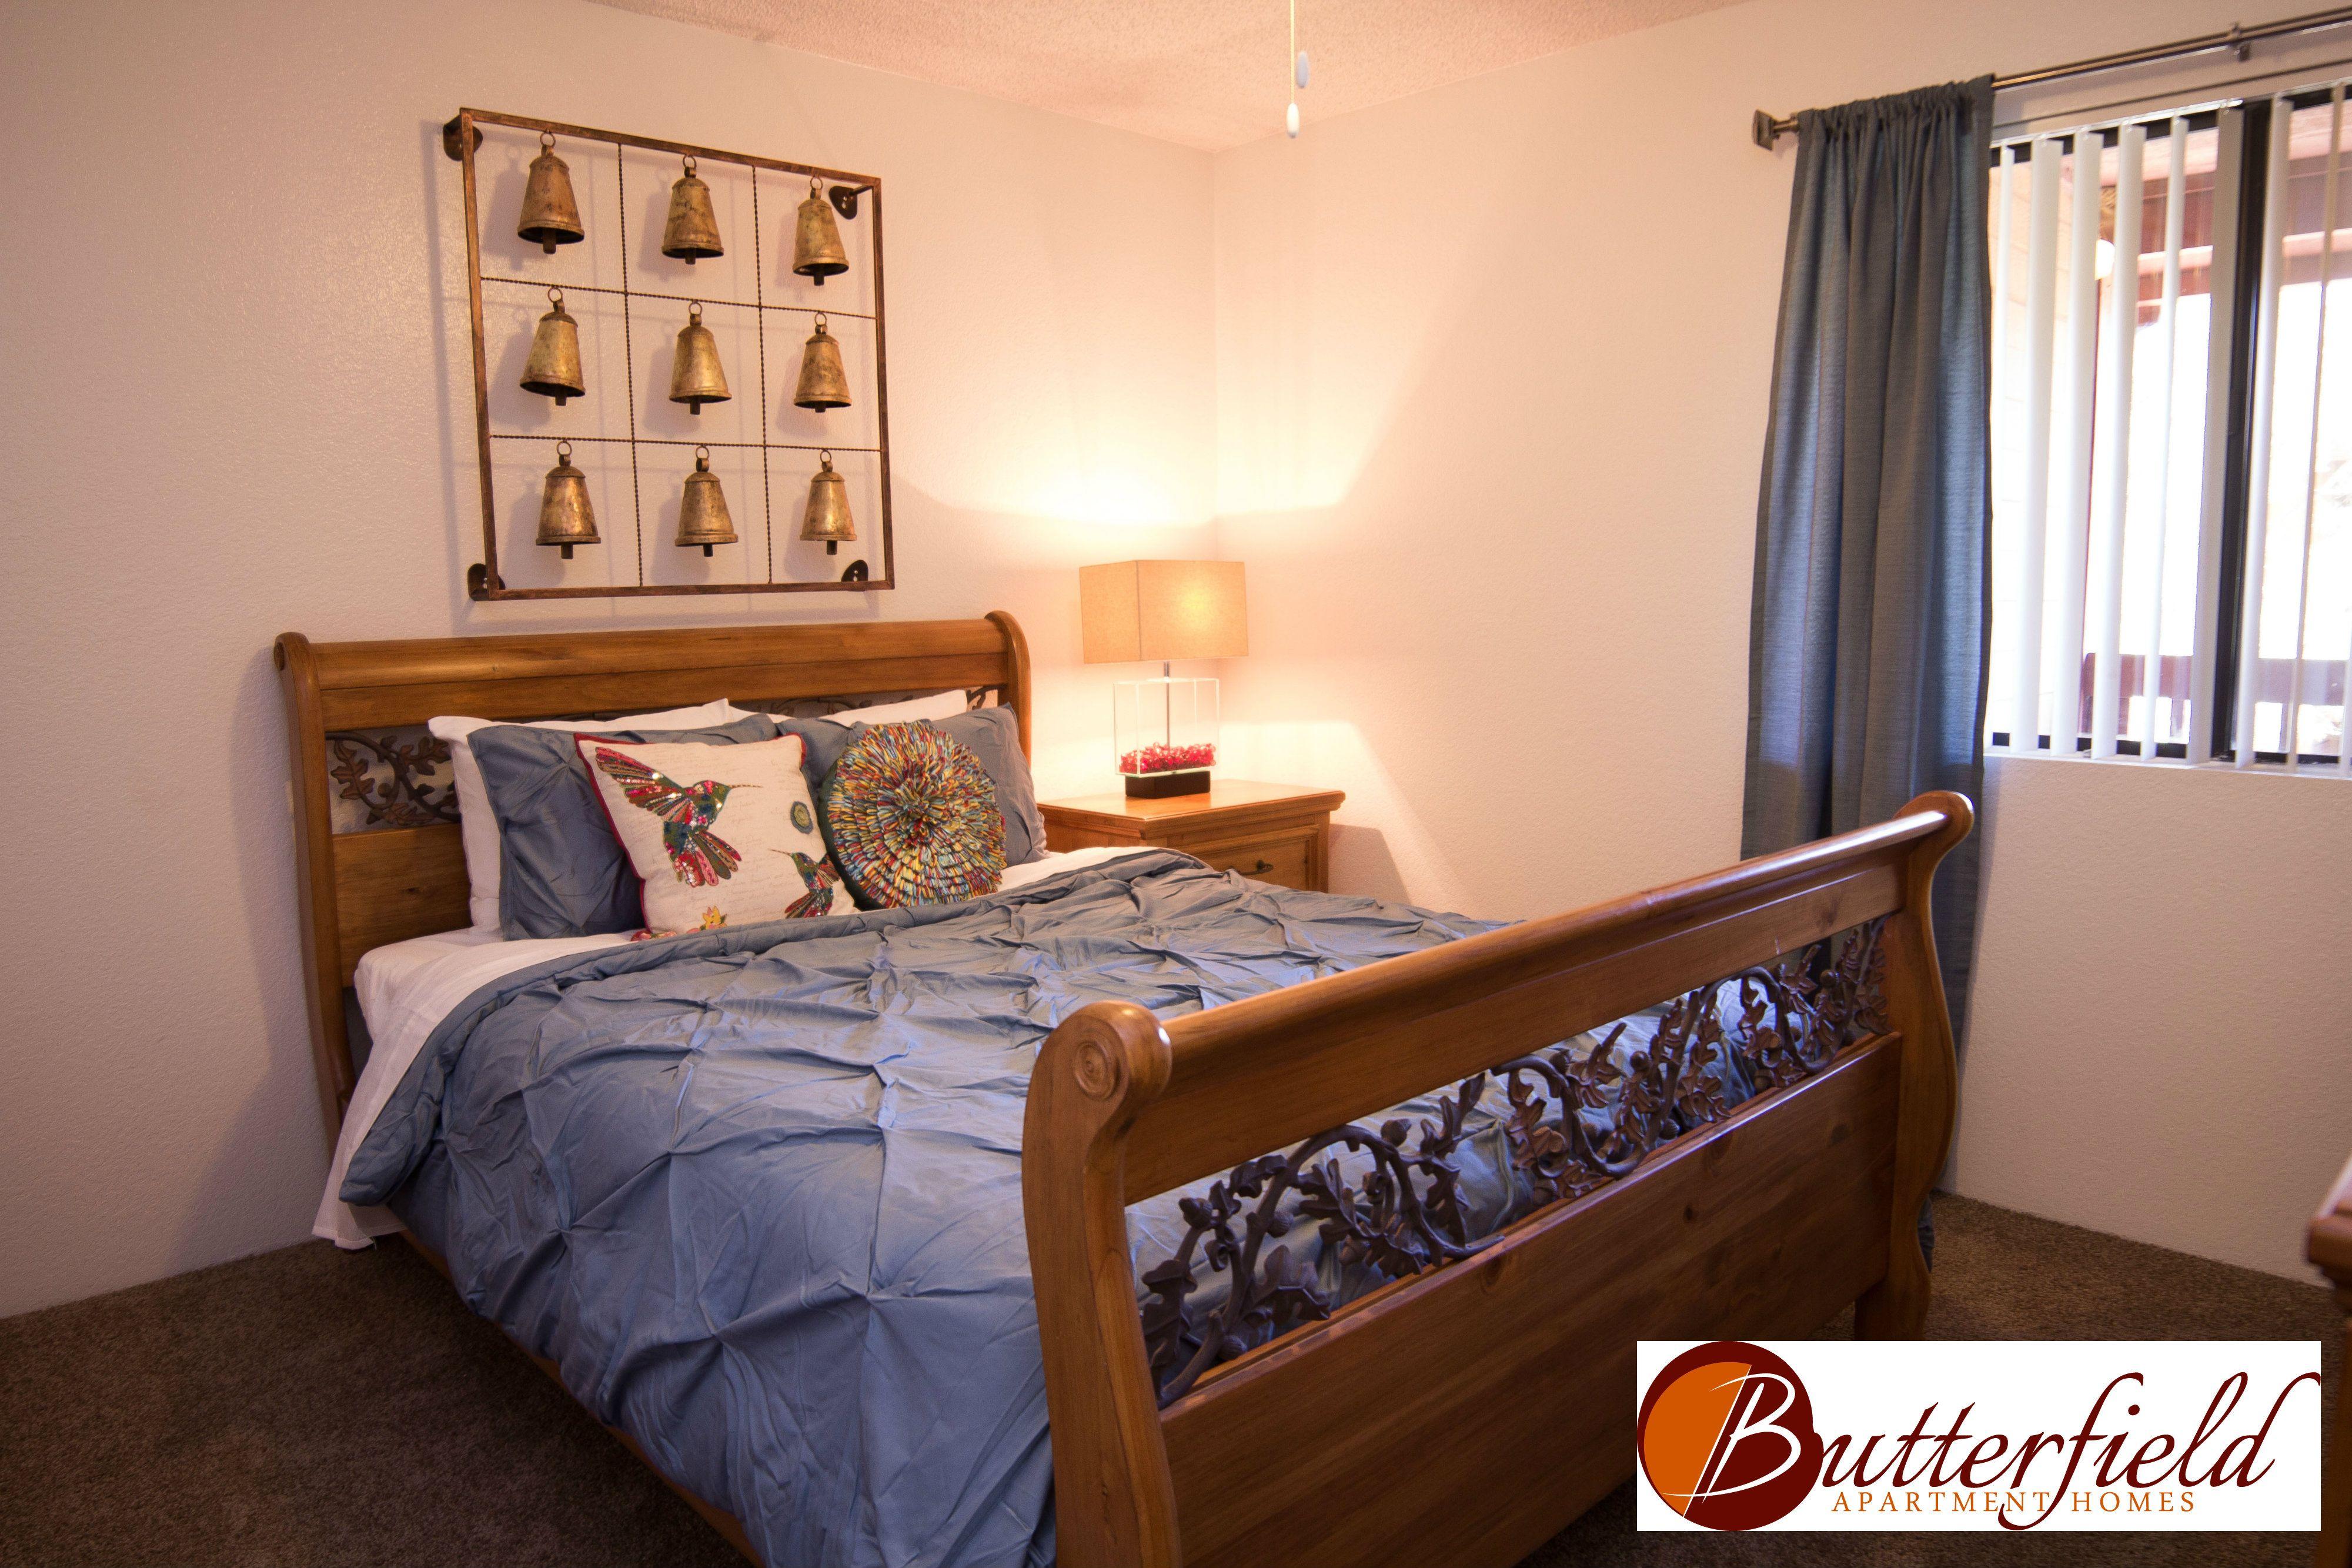 Butterfield Apartments 1 Bedroom Model, Flagstaff, AZ